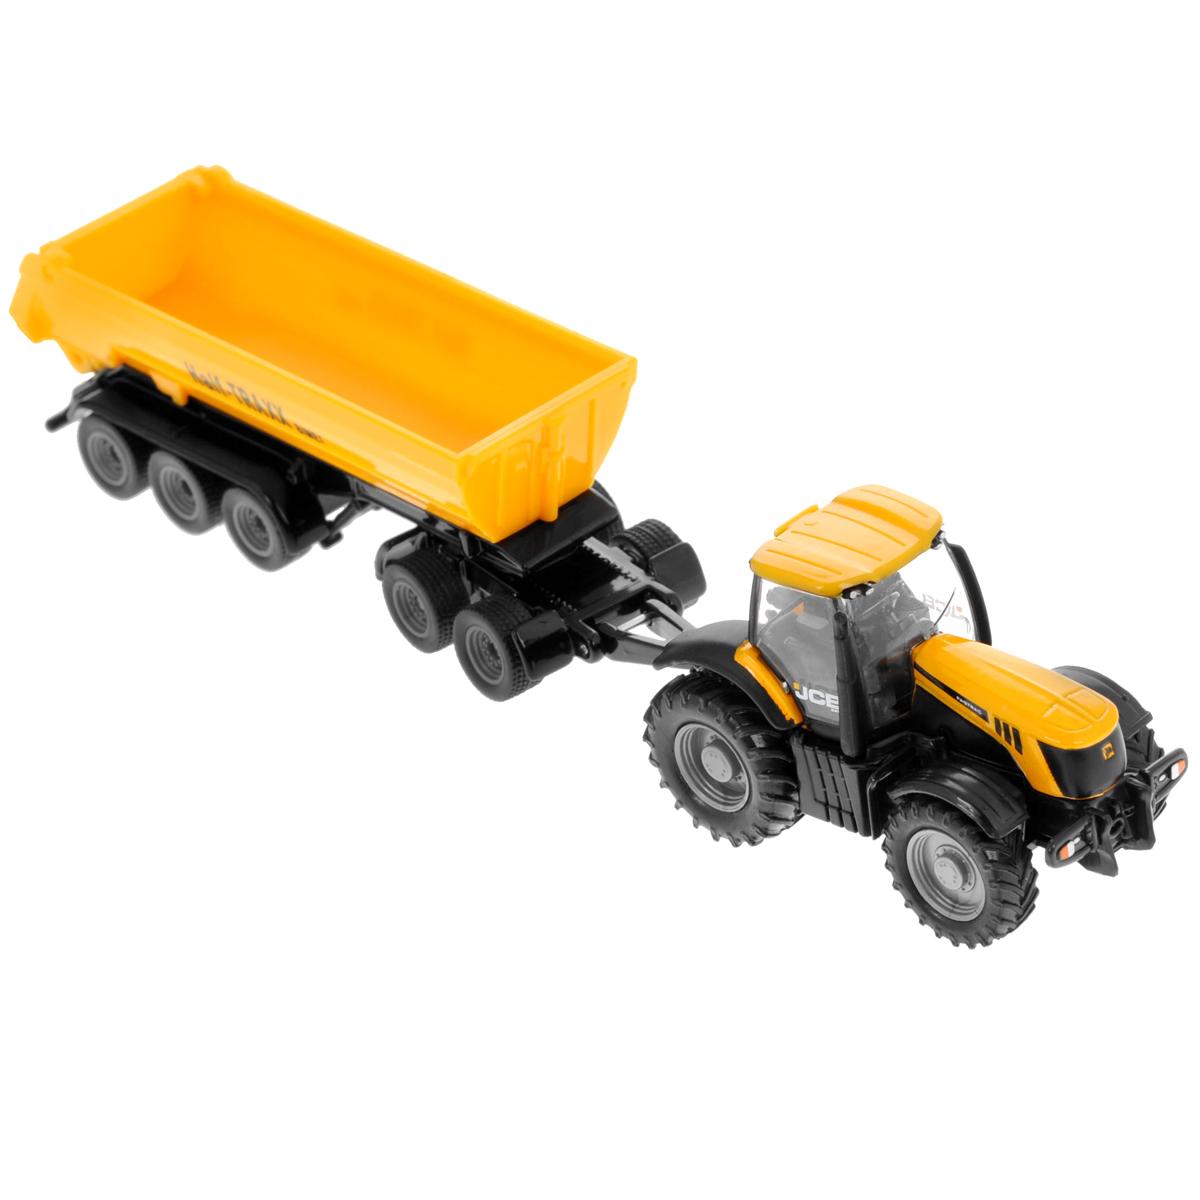 Siku Трактор JCB 8250 с прицепом-кузовом плоскогубцы jcb jpl005